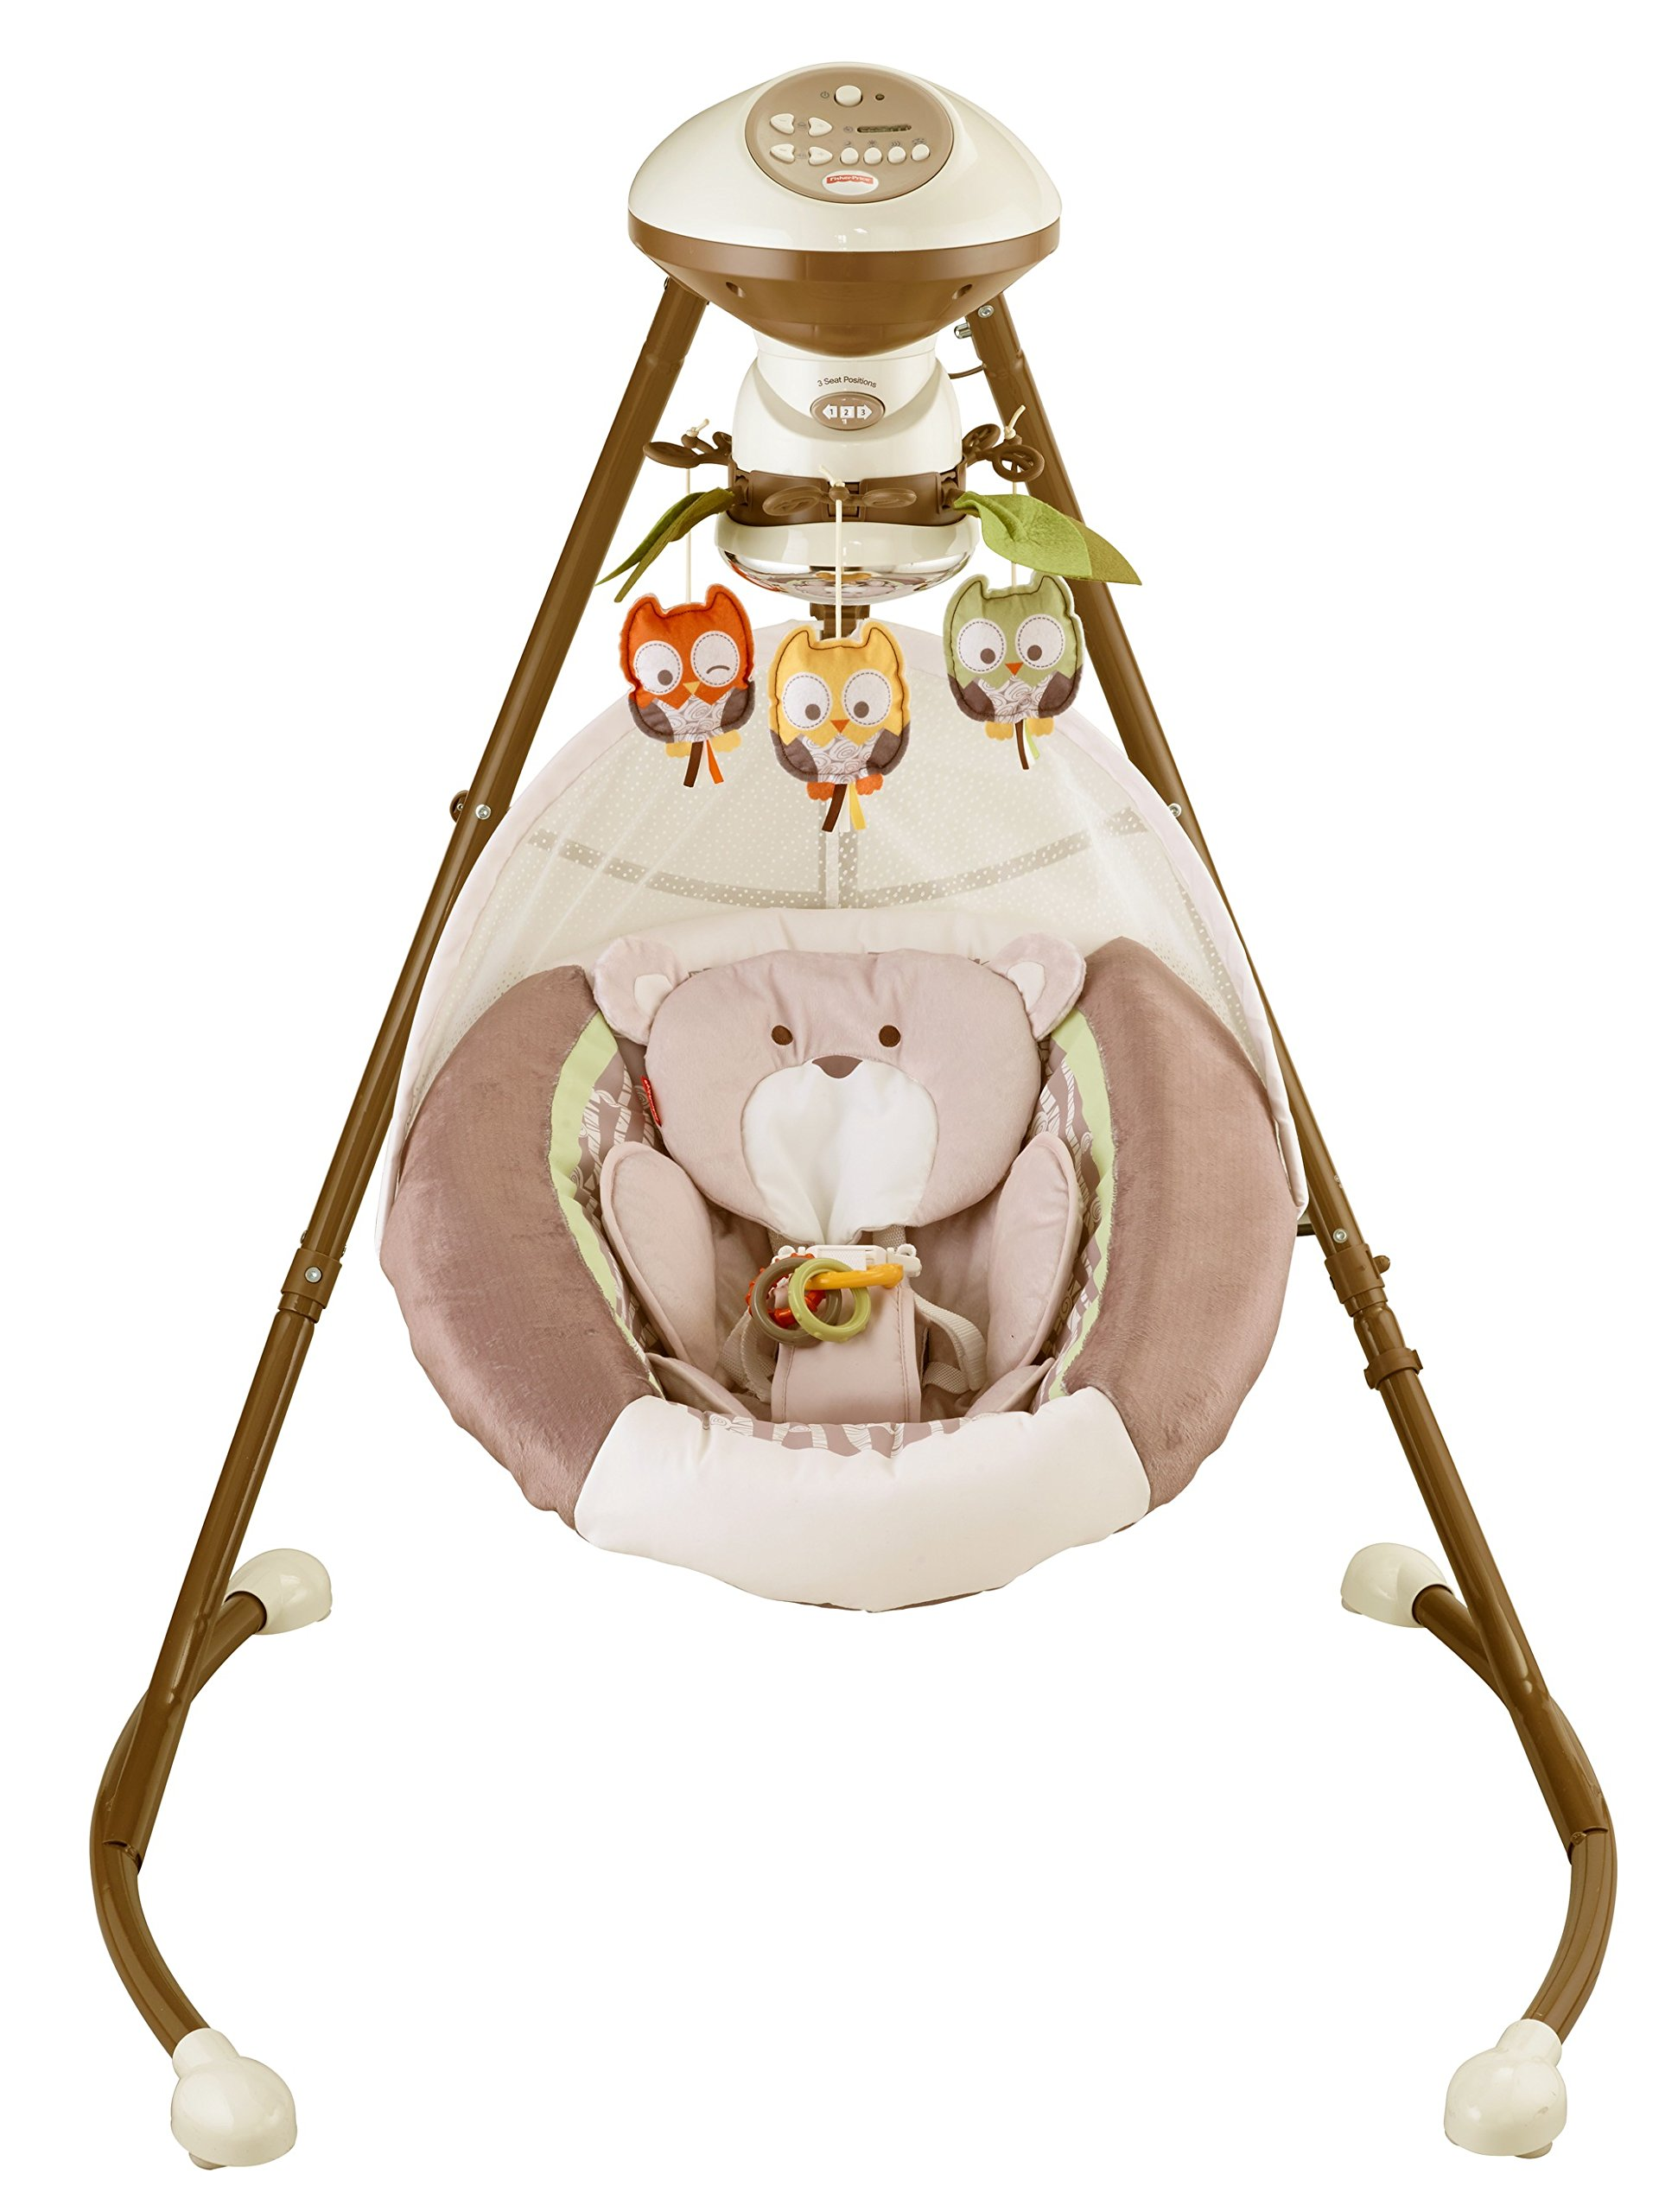 Fisher-Price My Little Snugabear Cradle 'n Swing